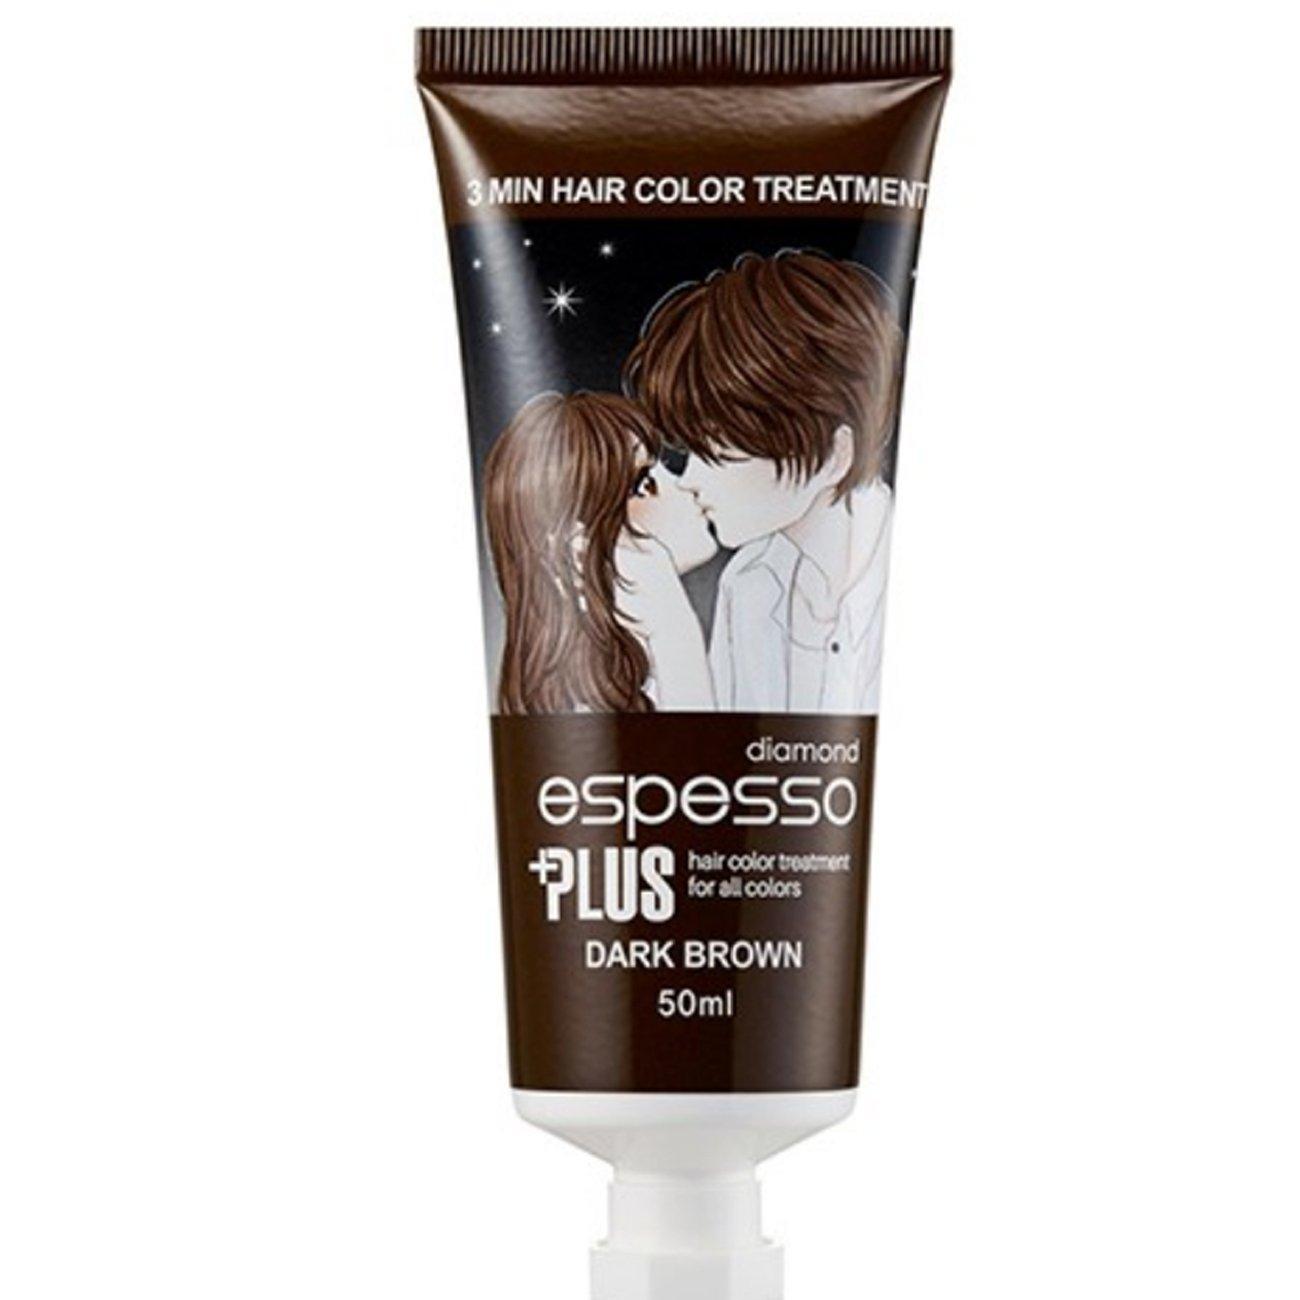 Hair Manicure Polish Color ESPESSO PLUS 50ml Diamond Powder Dark Brown Coating with Color K-Beauty MI Korea Intercos